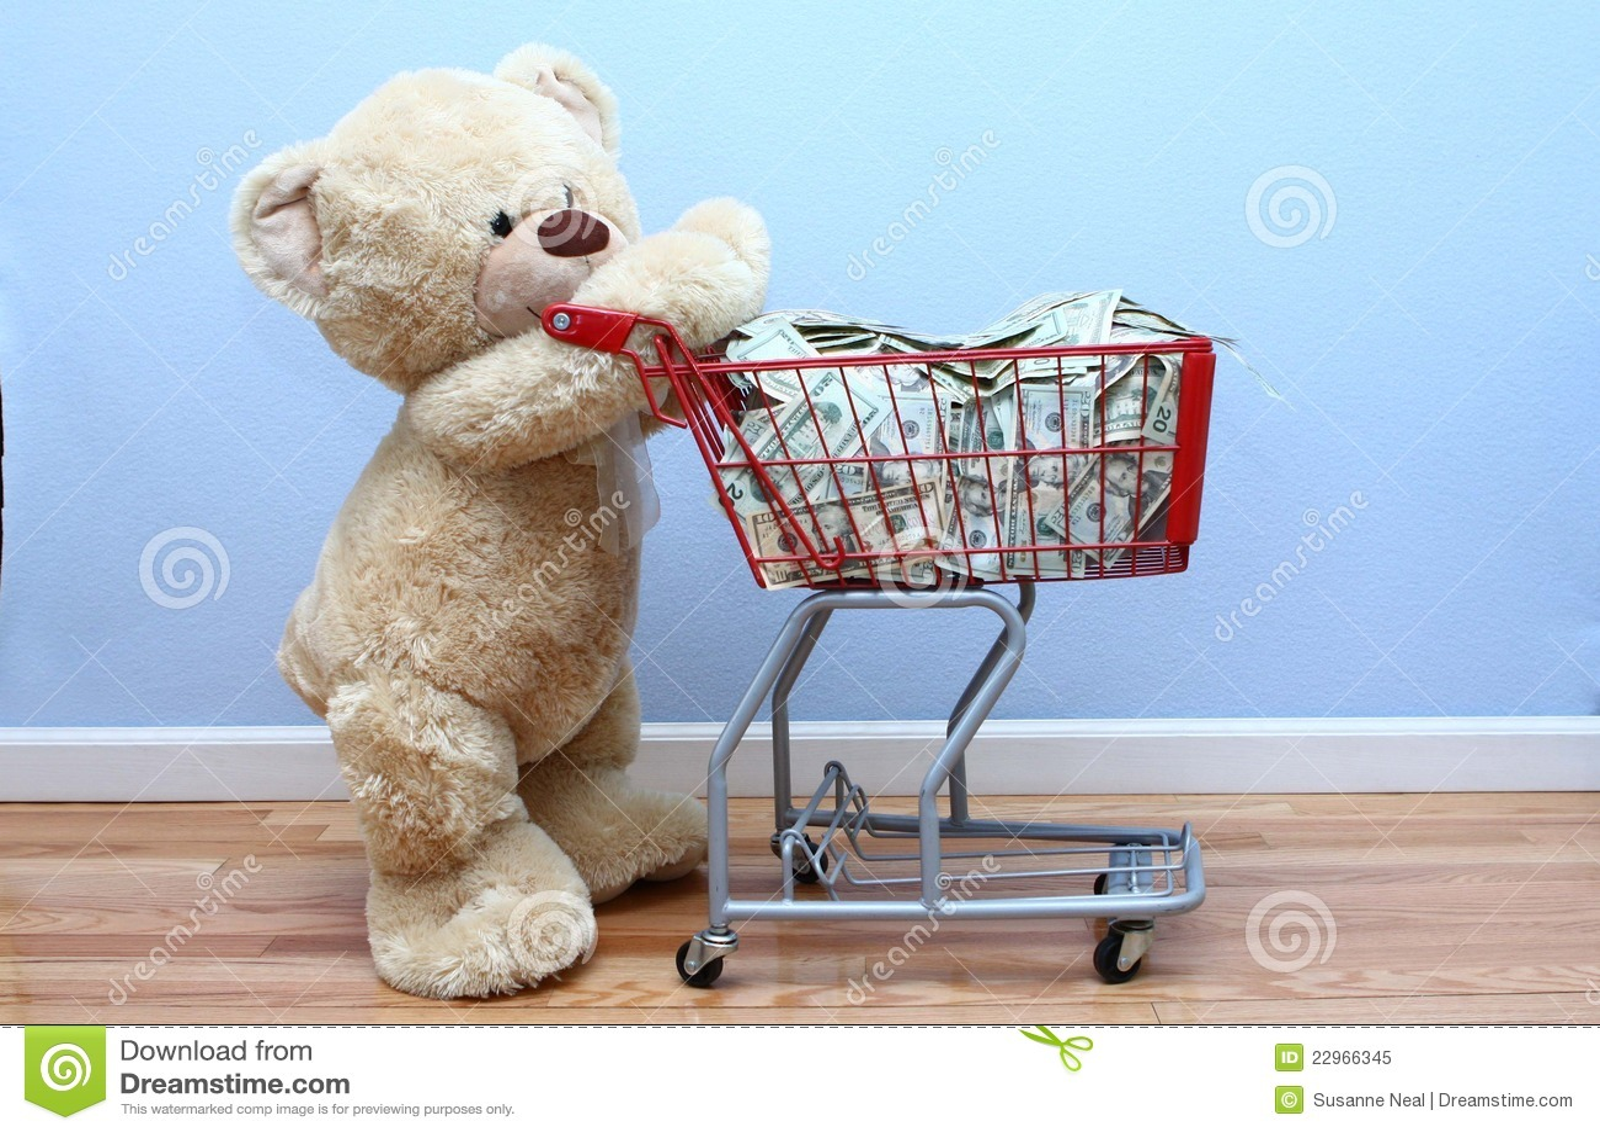 Big Teddy Bear Pushing Money In Shopping Cart Stock Image